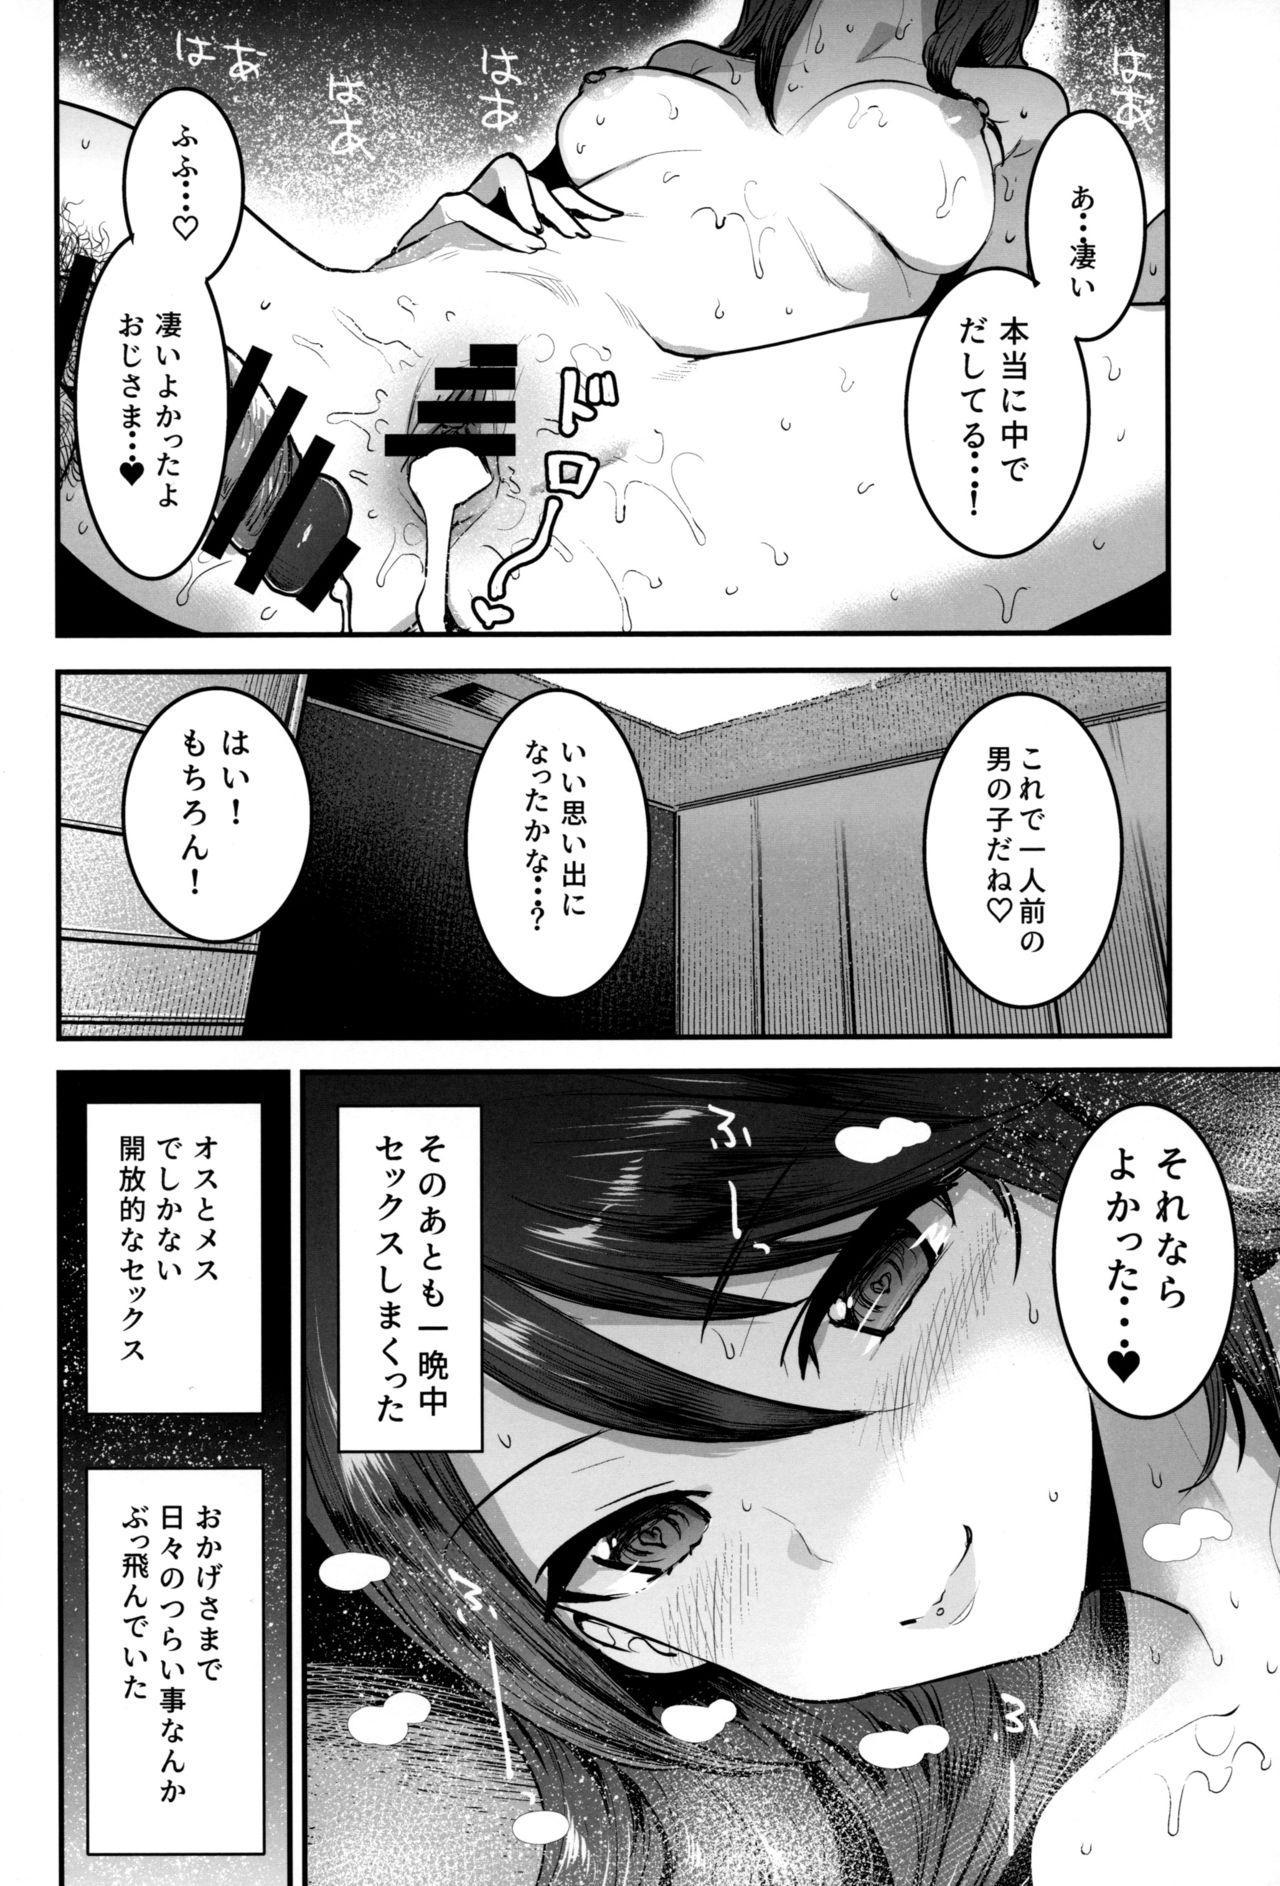 GirlPan Rakugakichou 10 26